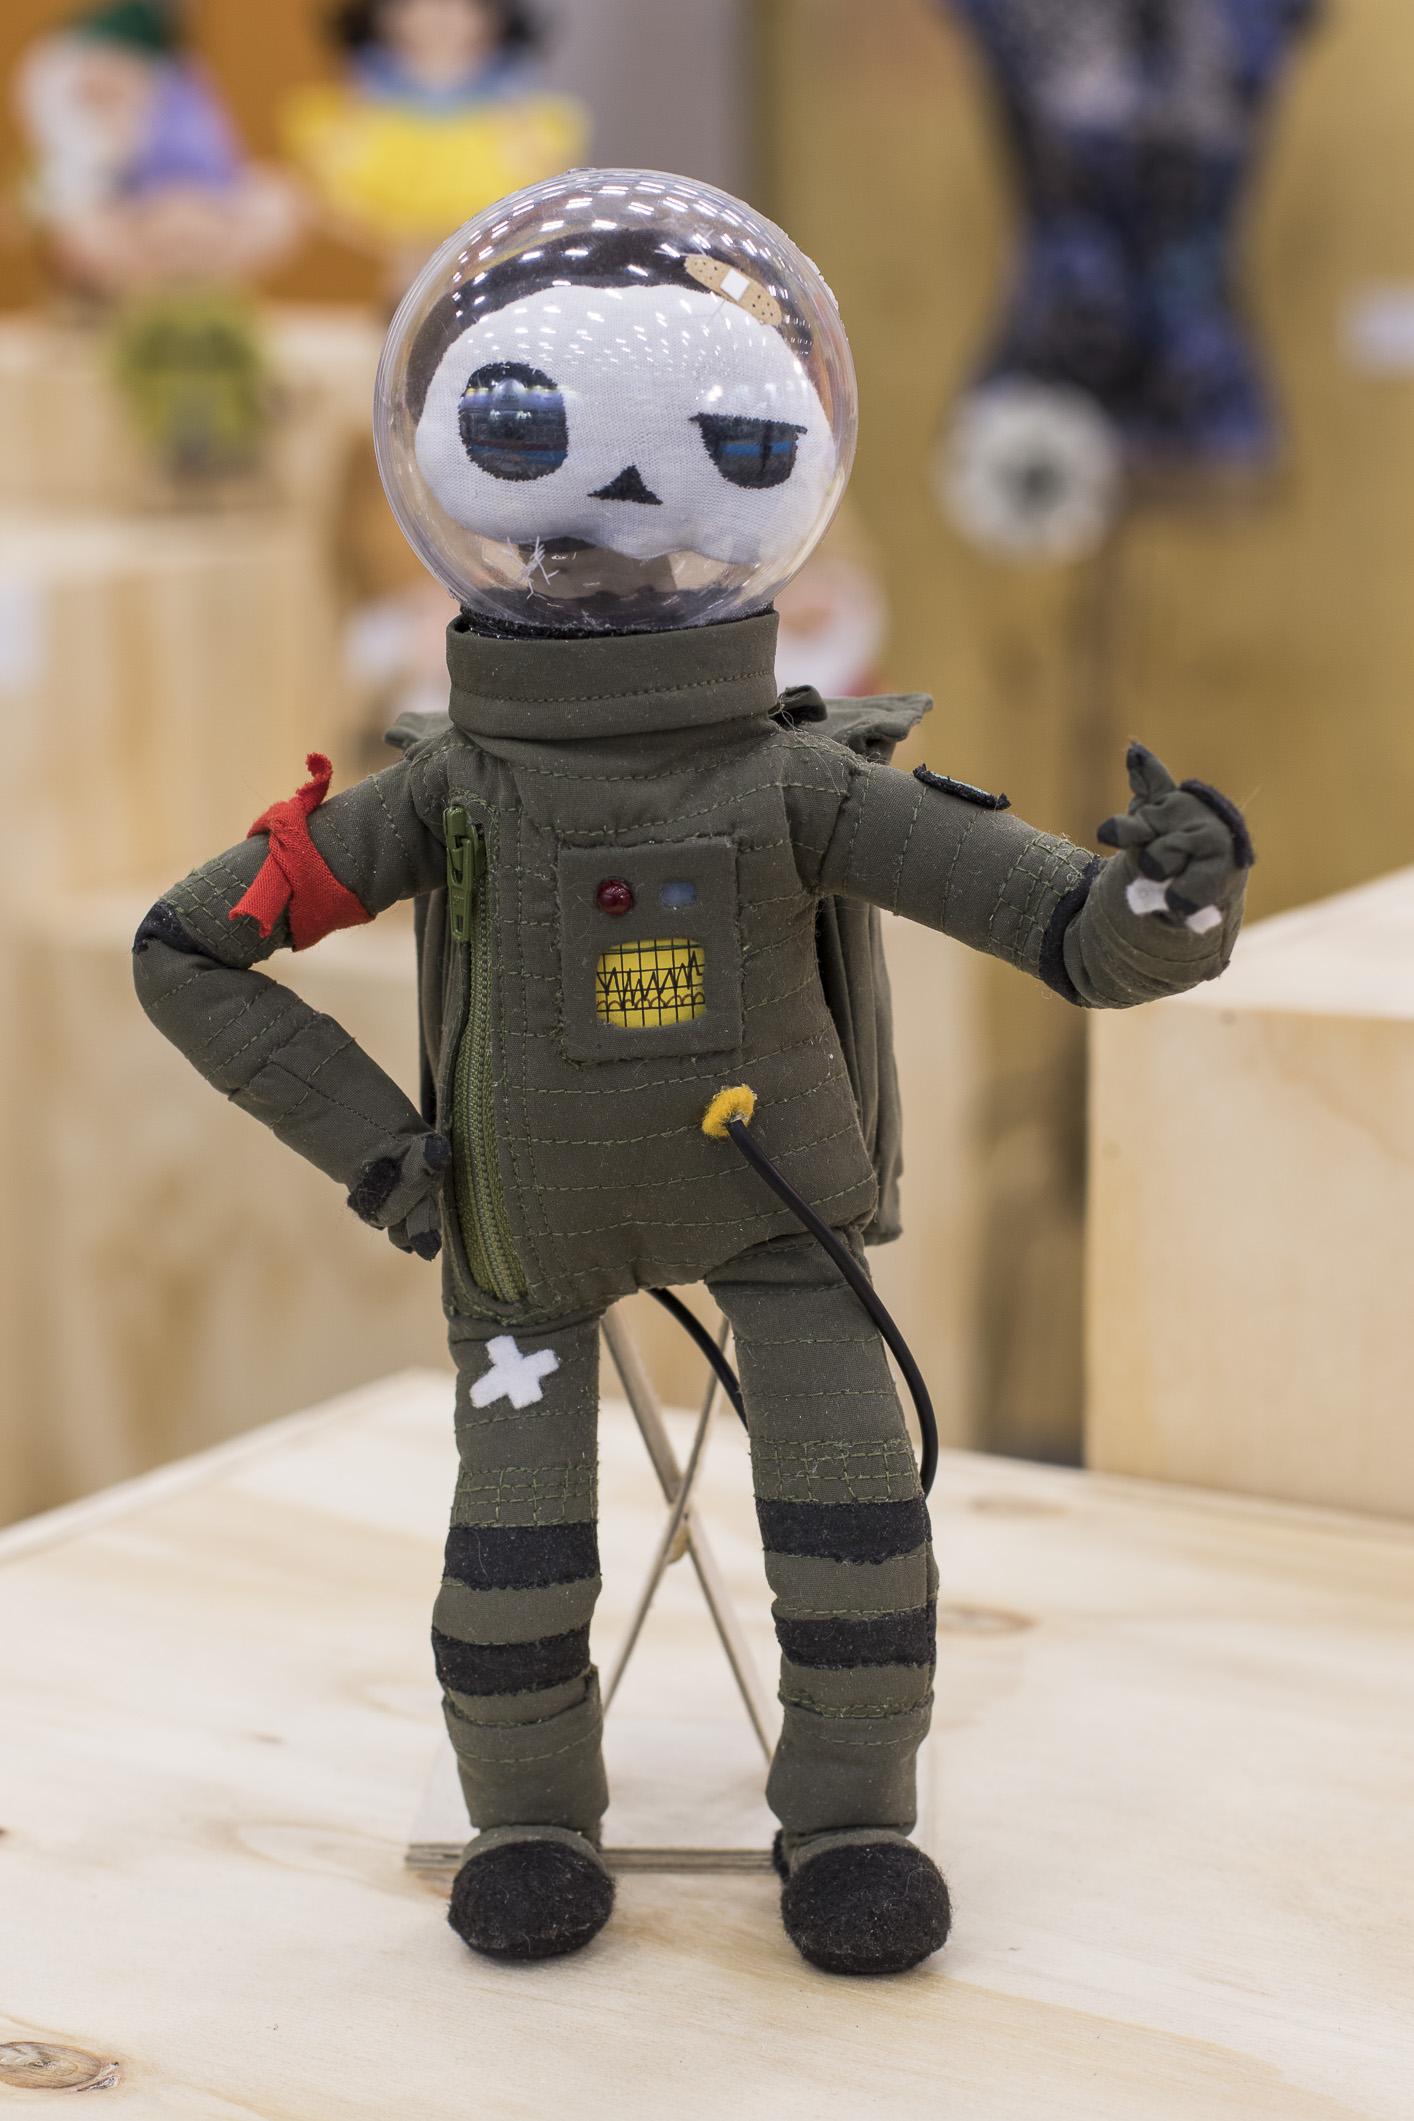 O Astronauta Morto, por Tio.Faso